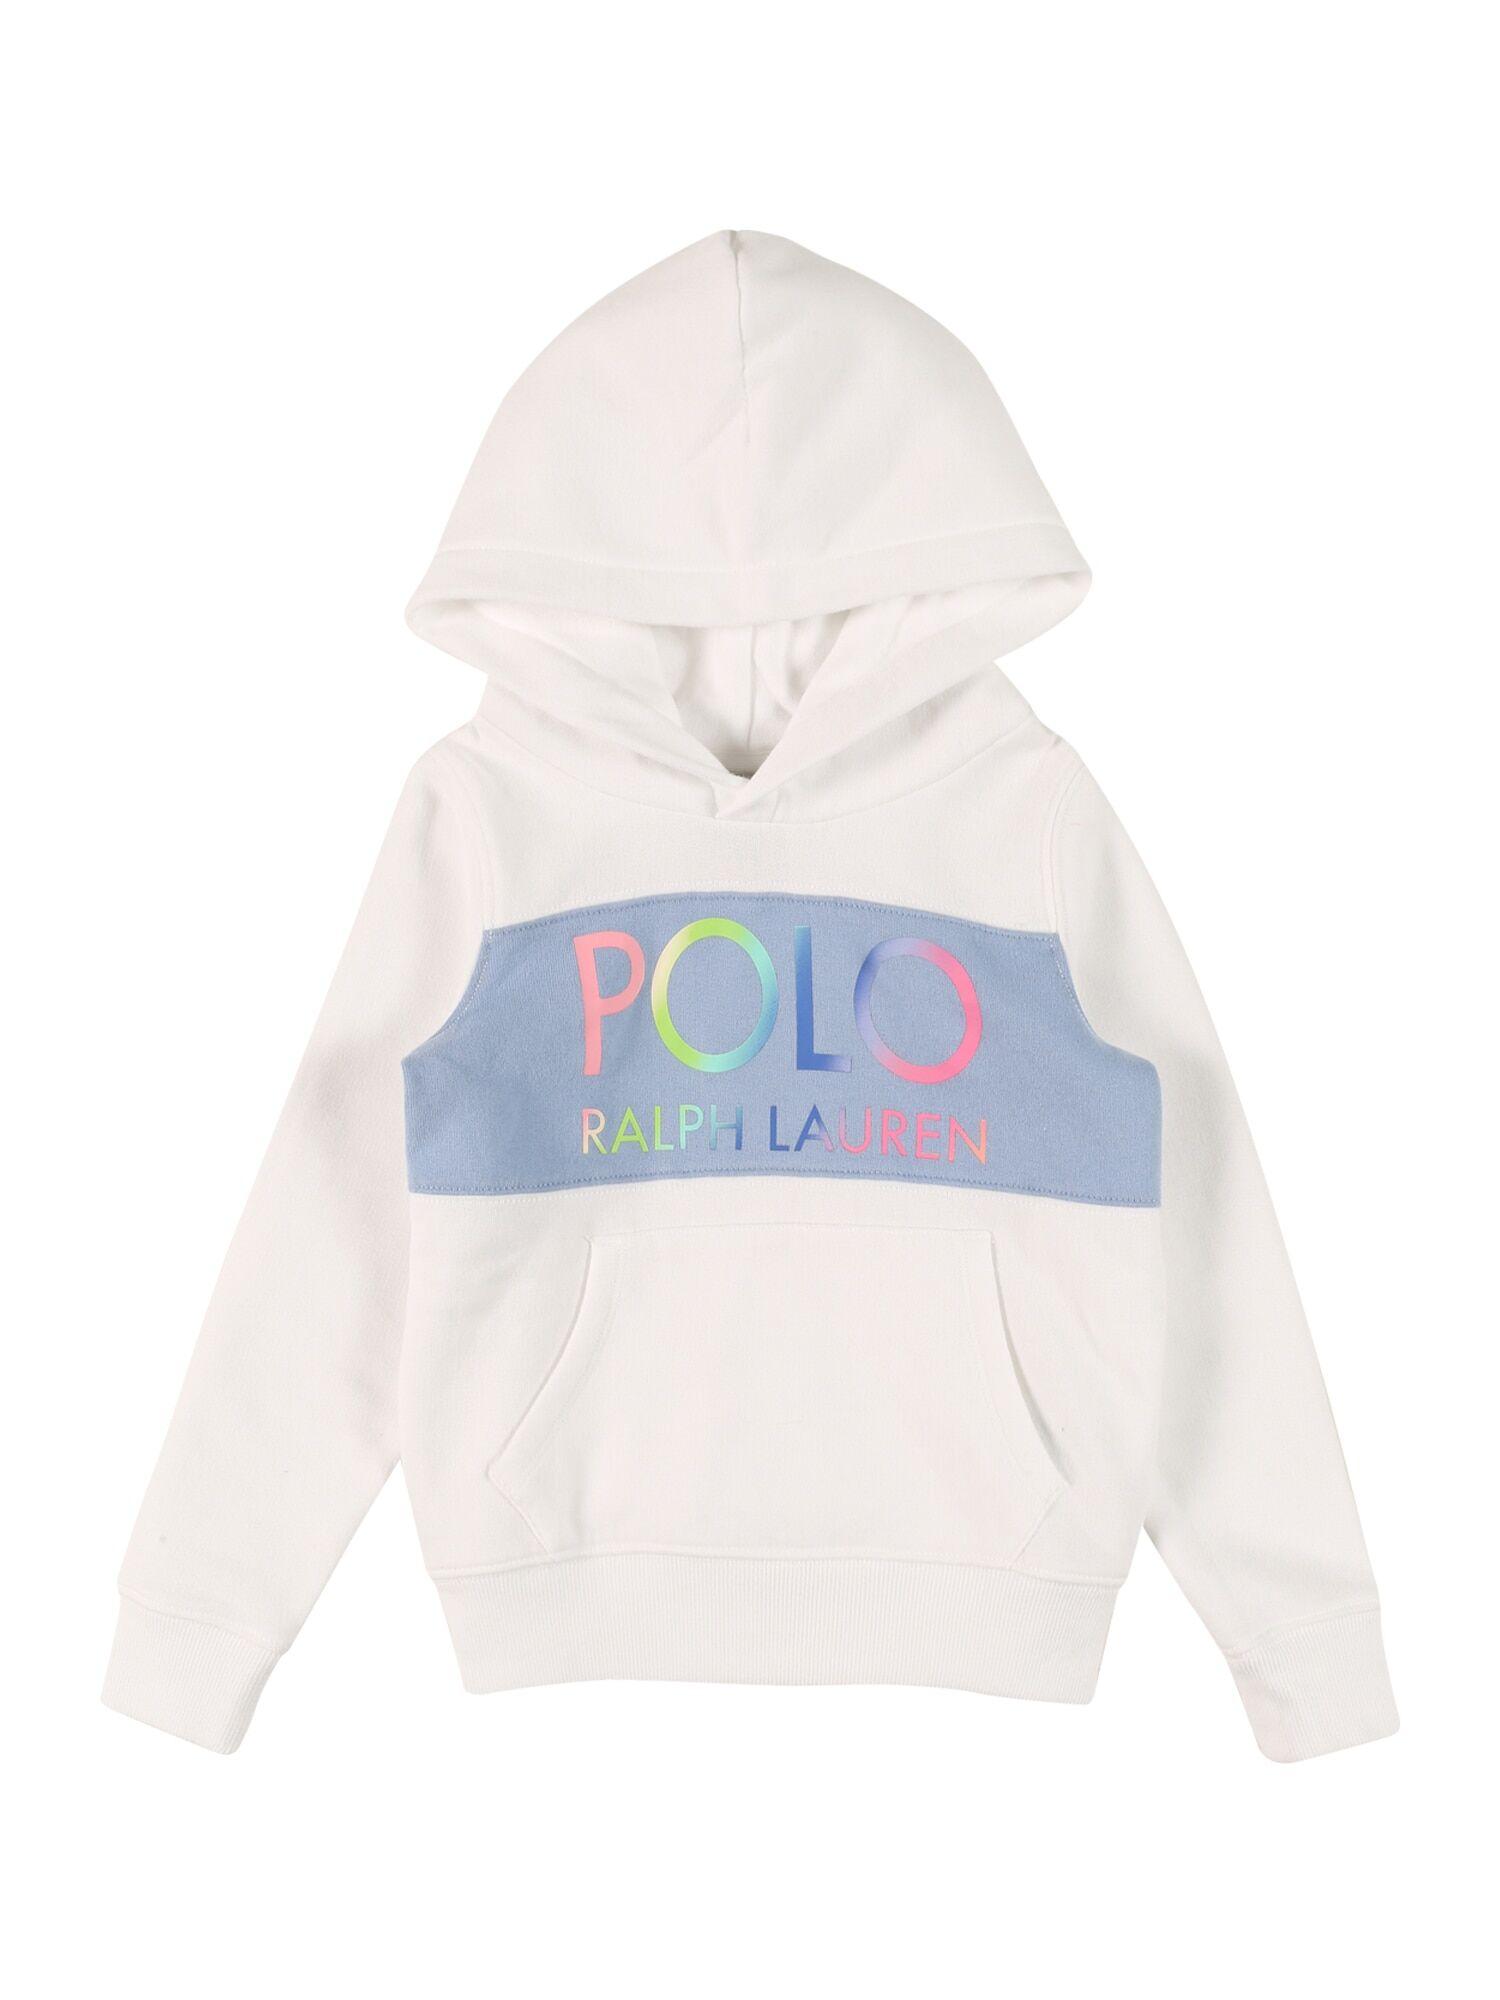 POLO RALPH LAUREN Sweat-shirt  - Blanc - Taille: 6 - girl